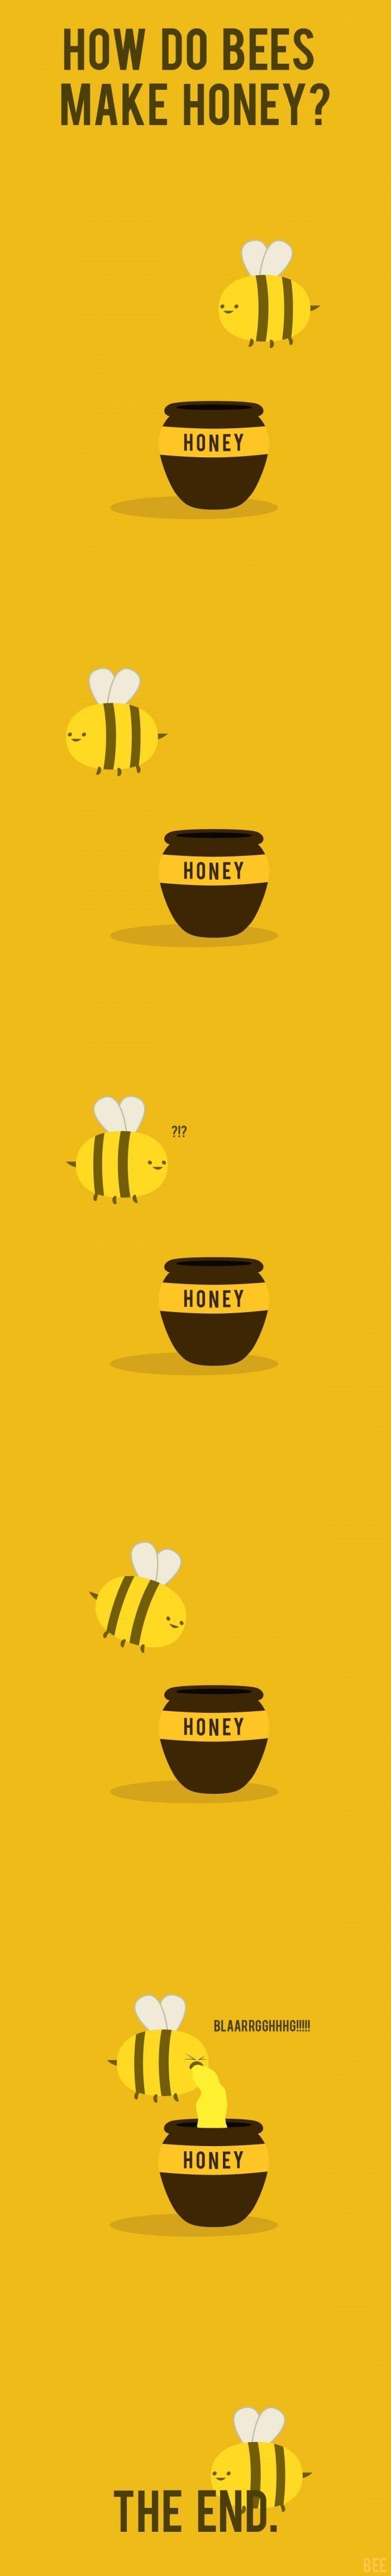 Honey. . IN BEES MAKE HONEY?. now roll it.